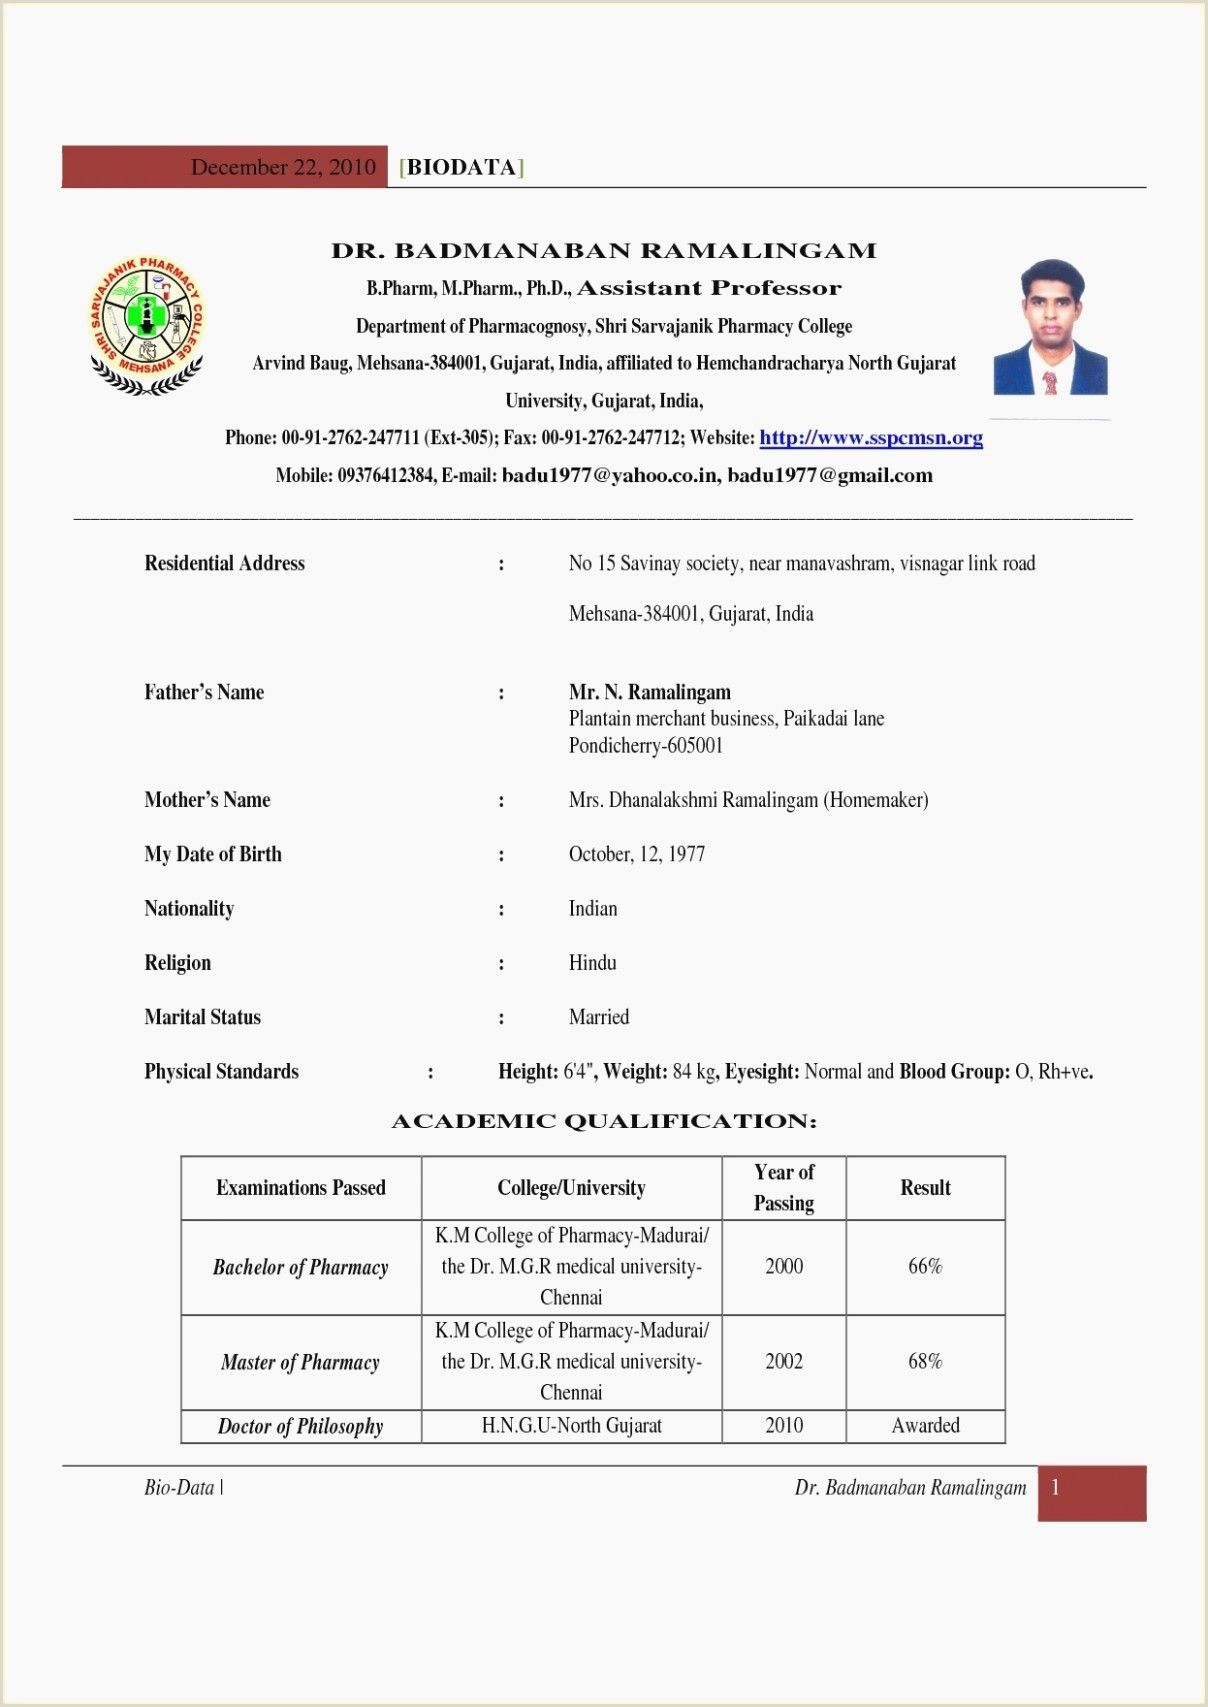 Fresher Resume format Doc India Fresher Resume format Doc